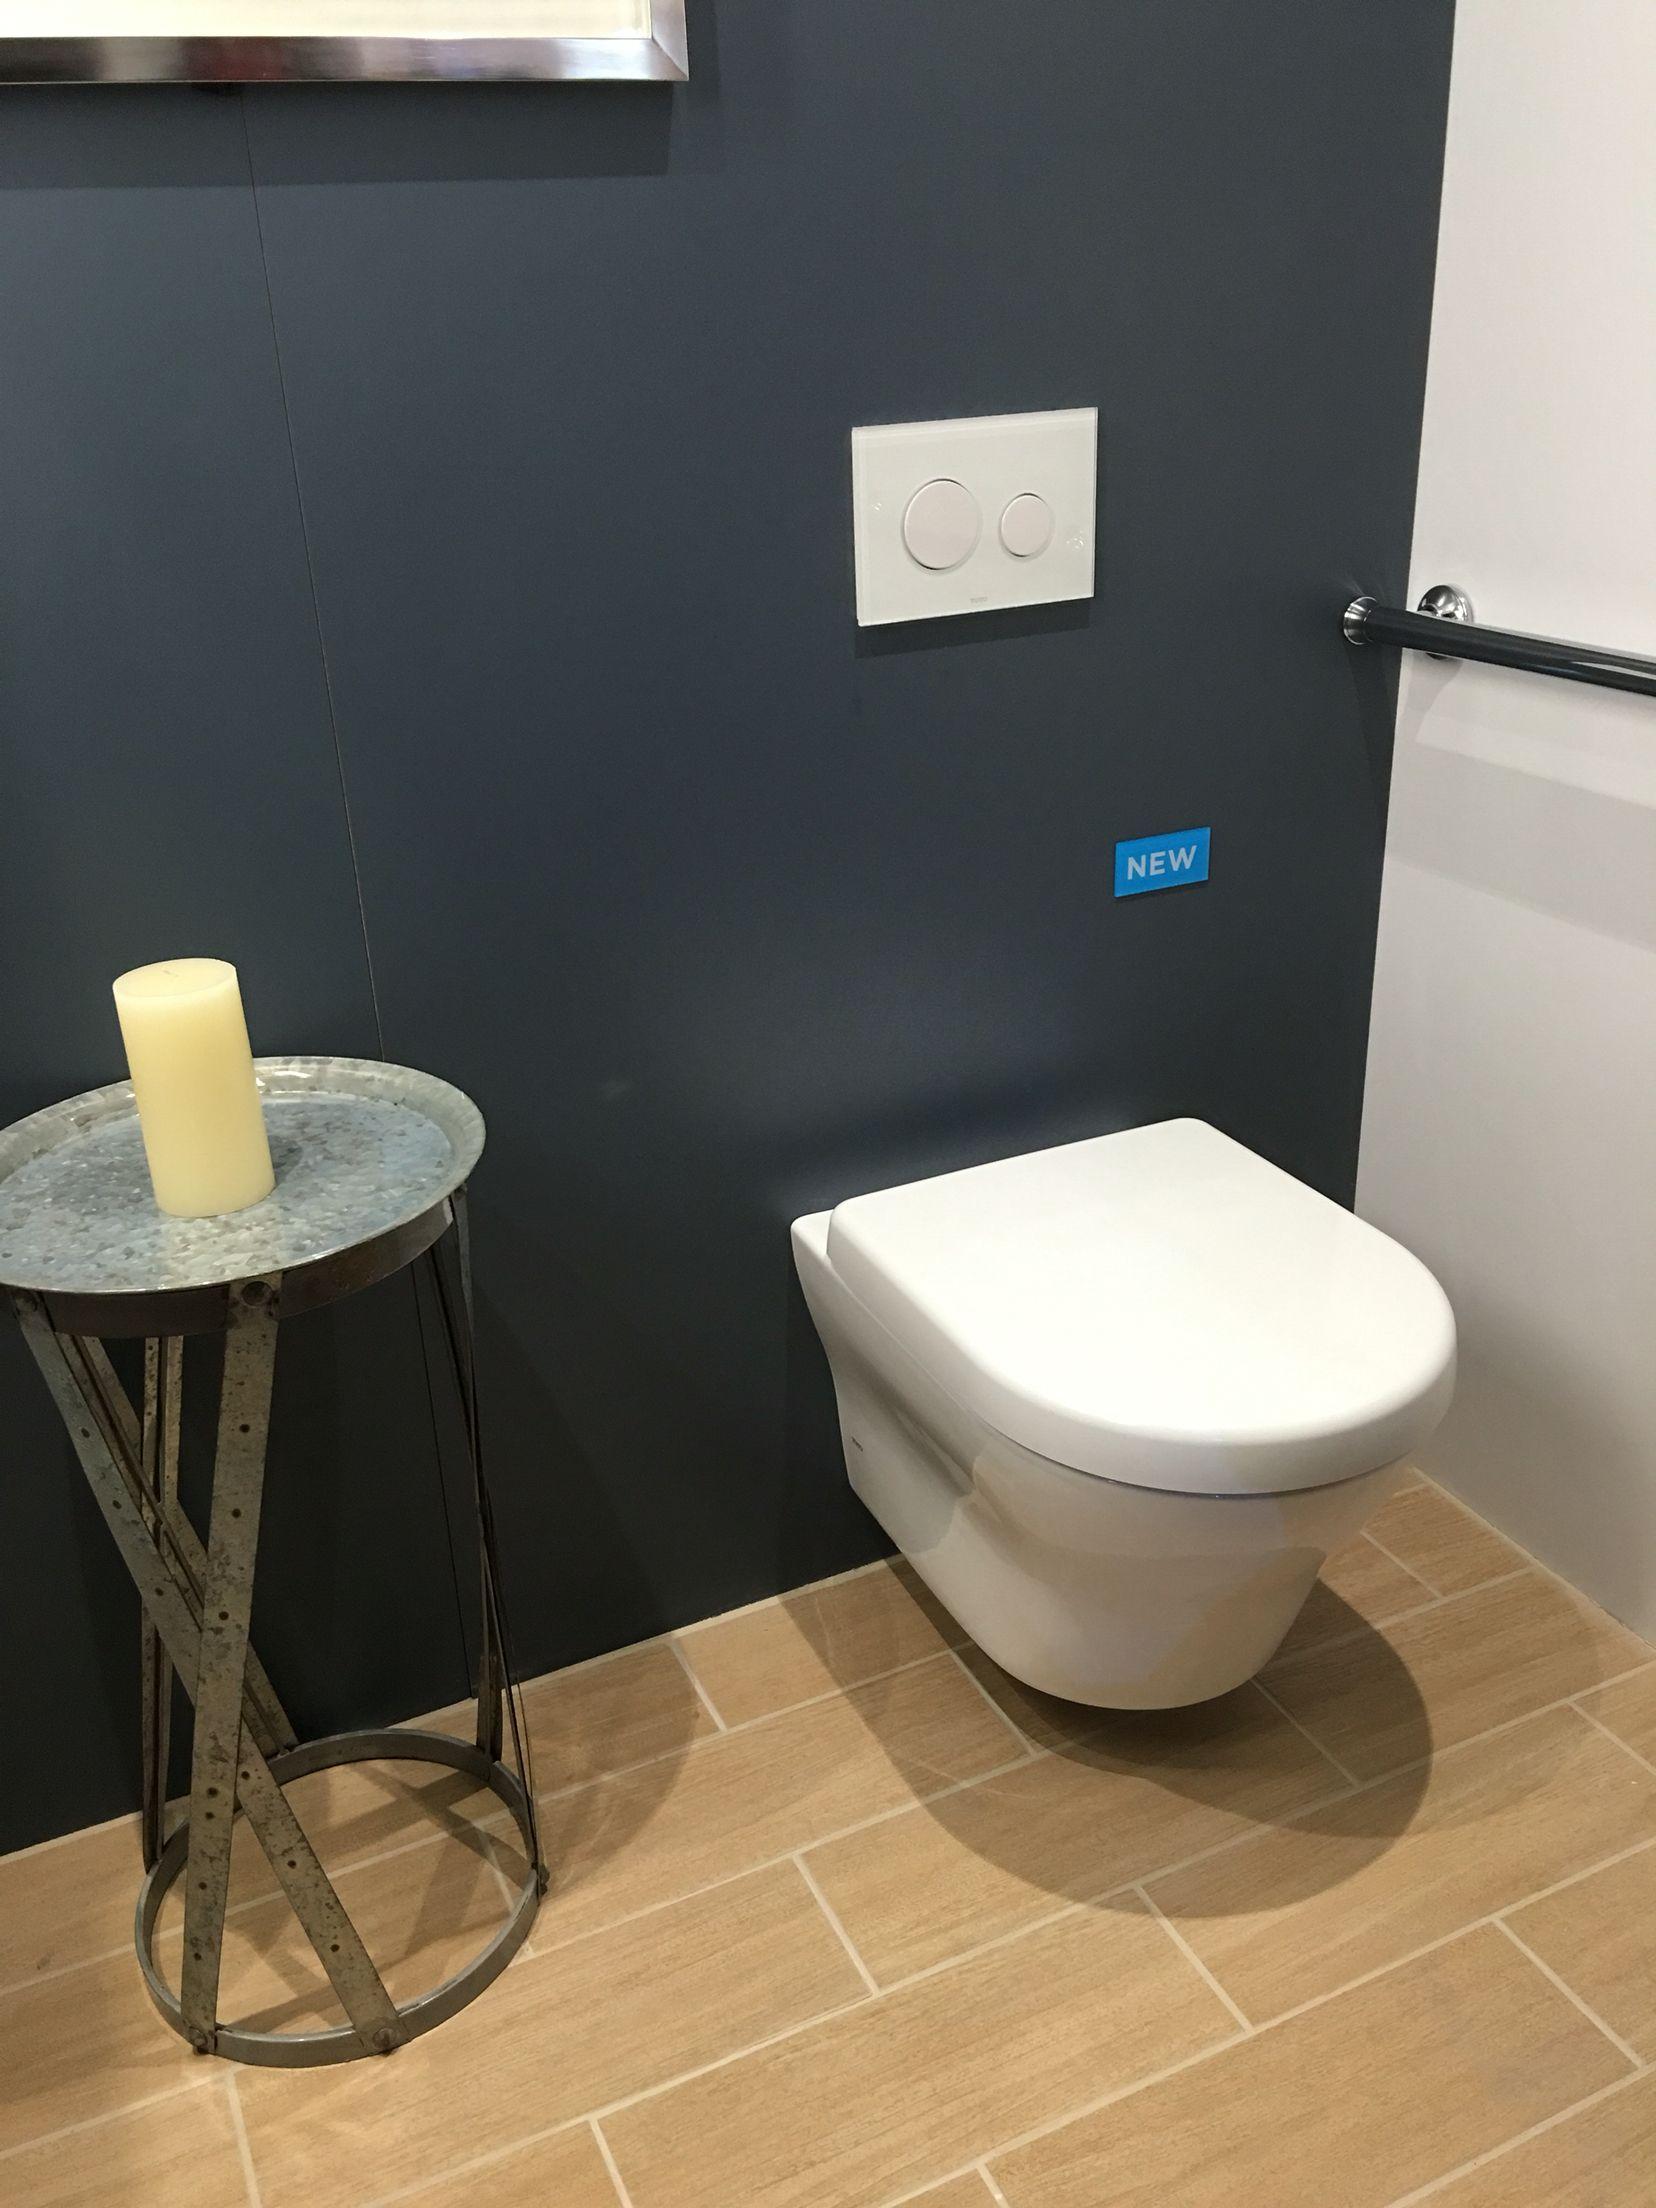 The space-saving, wall mount toilet from @totousa. #blogtourkbis ...